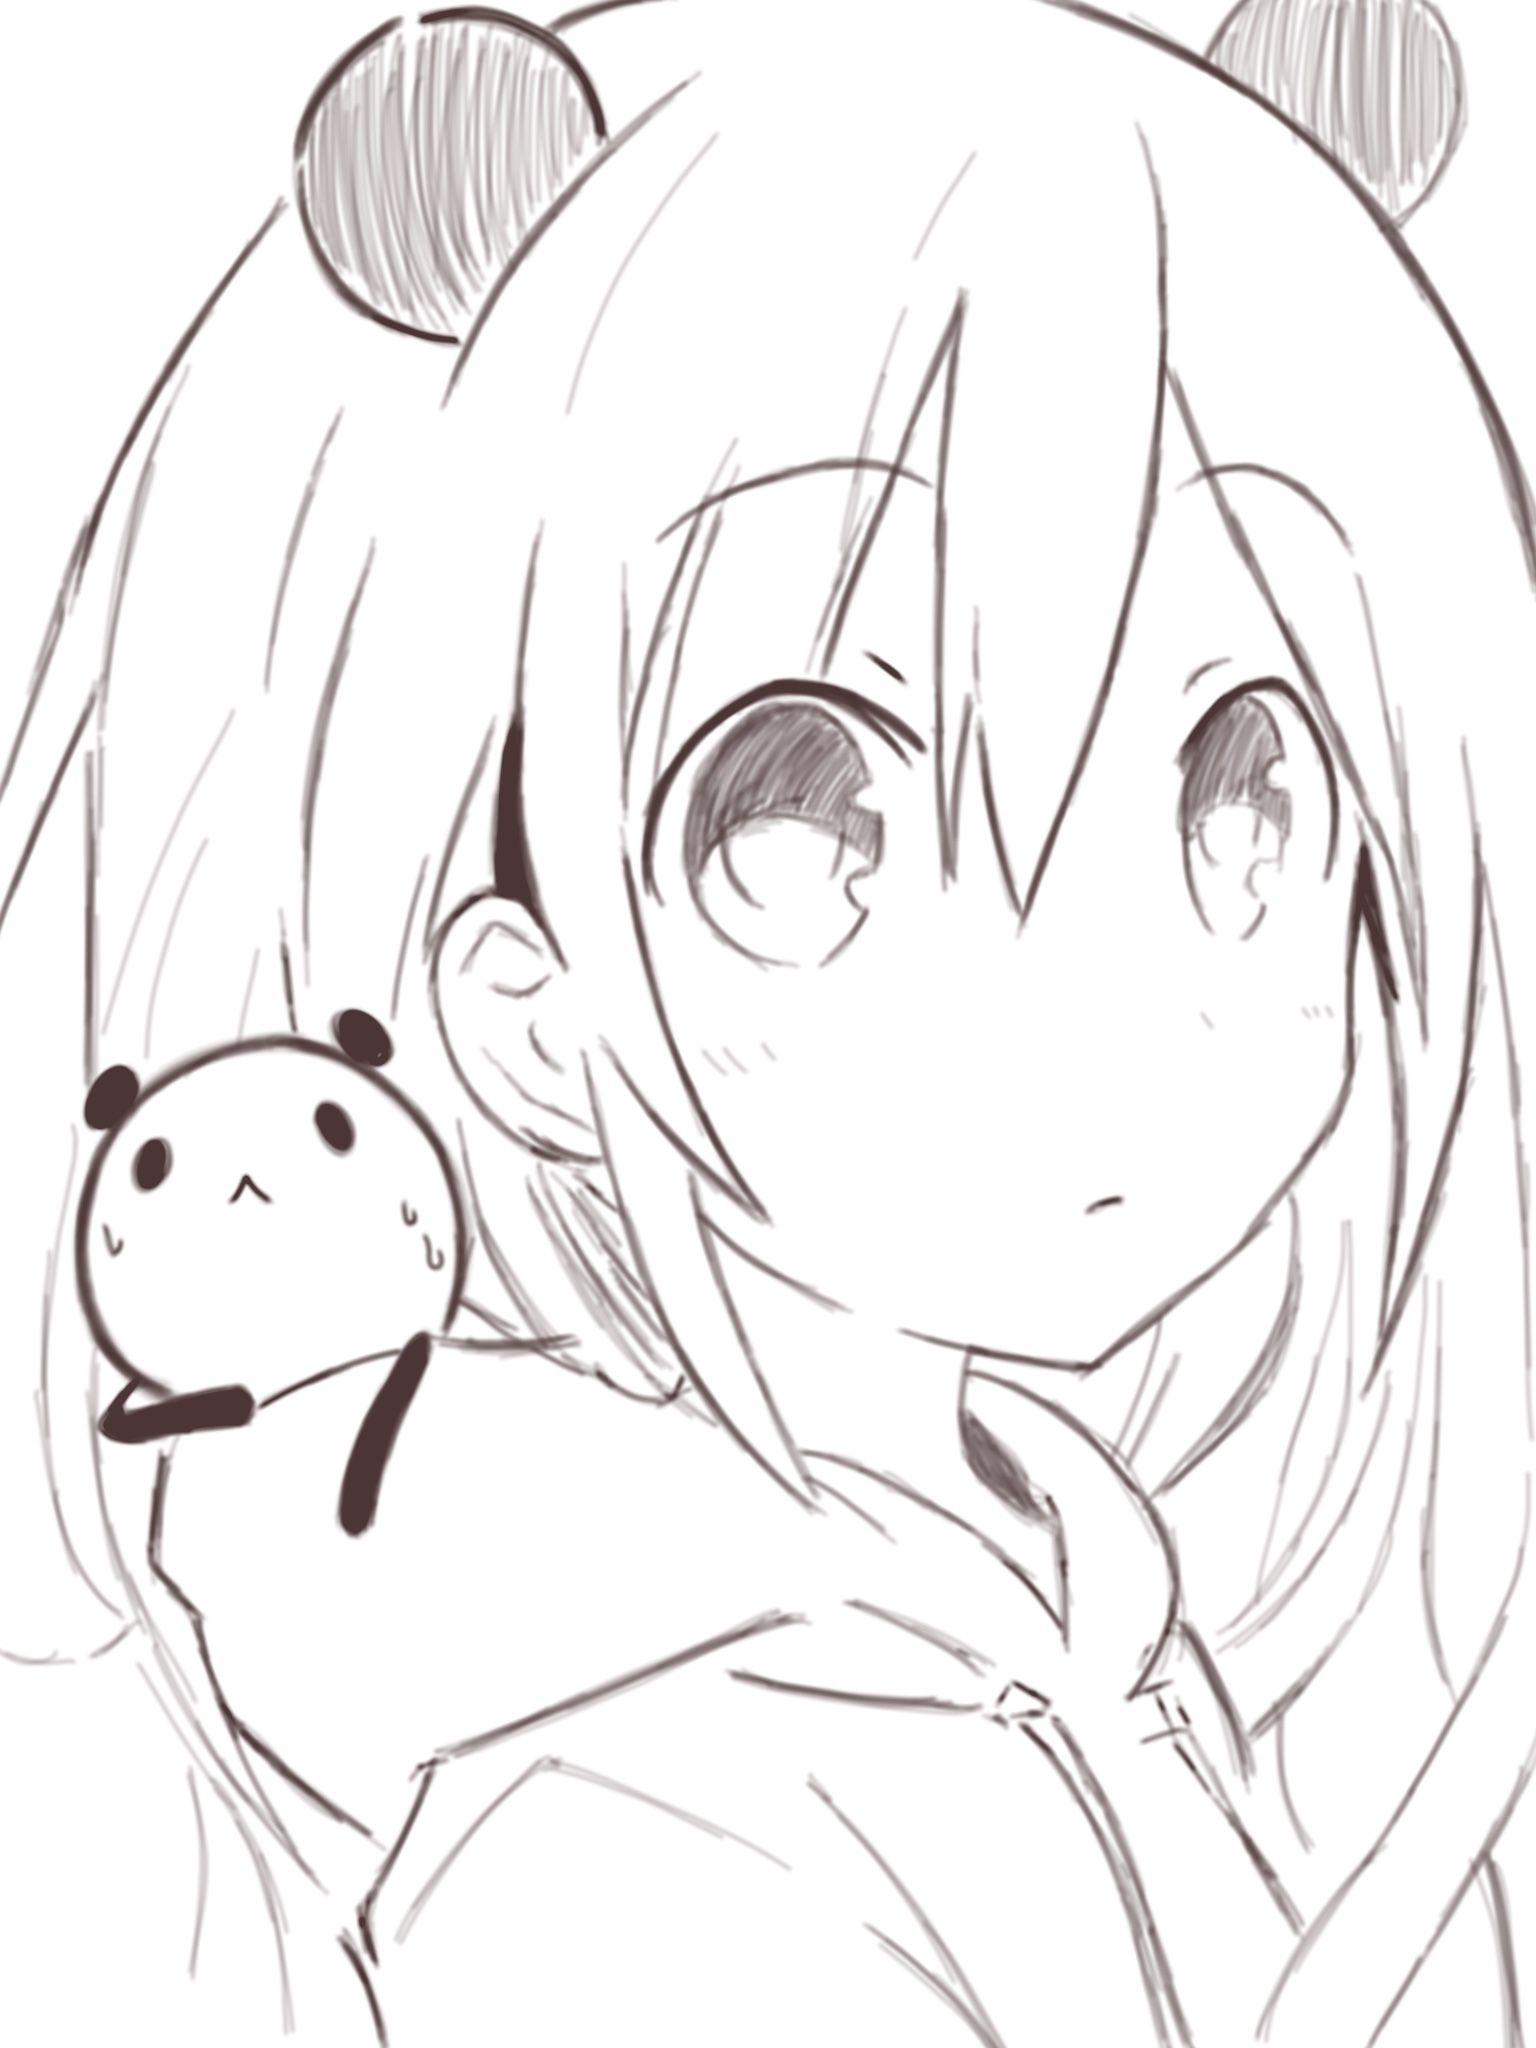 Anime. Anime Girl. Short White Hair. Panda. Kawaii